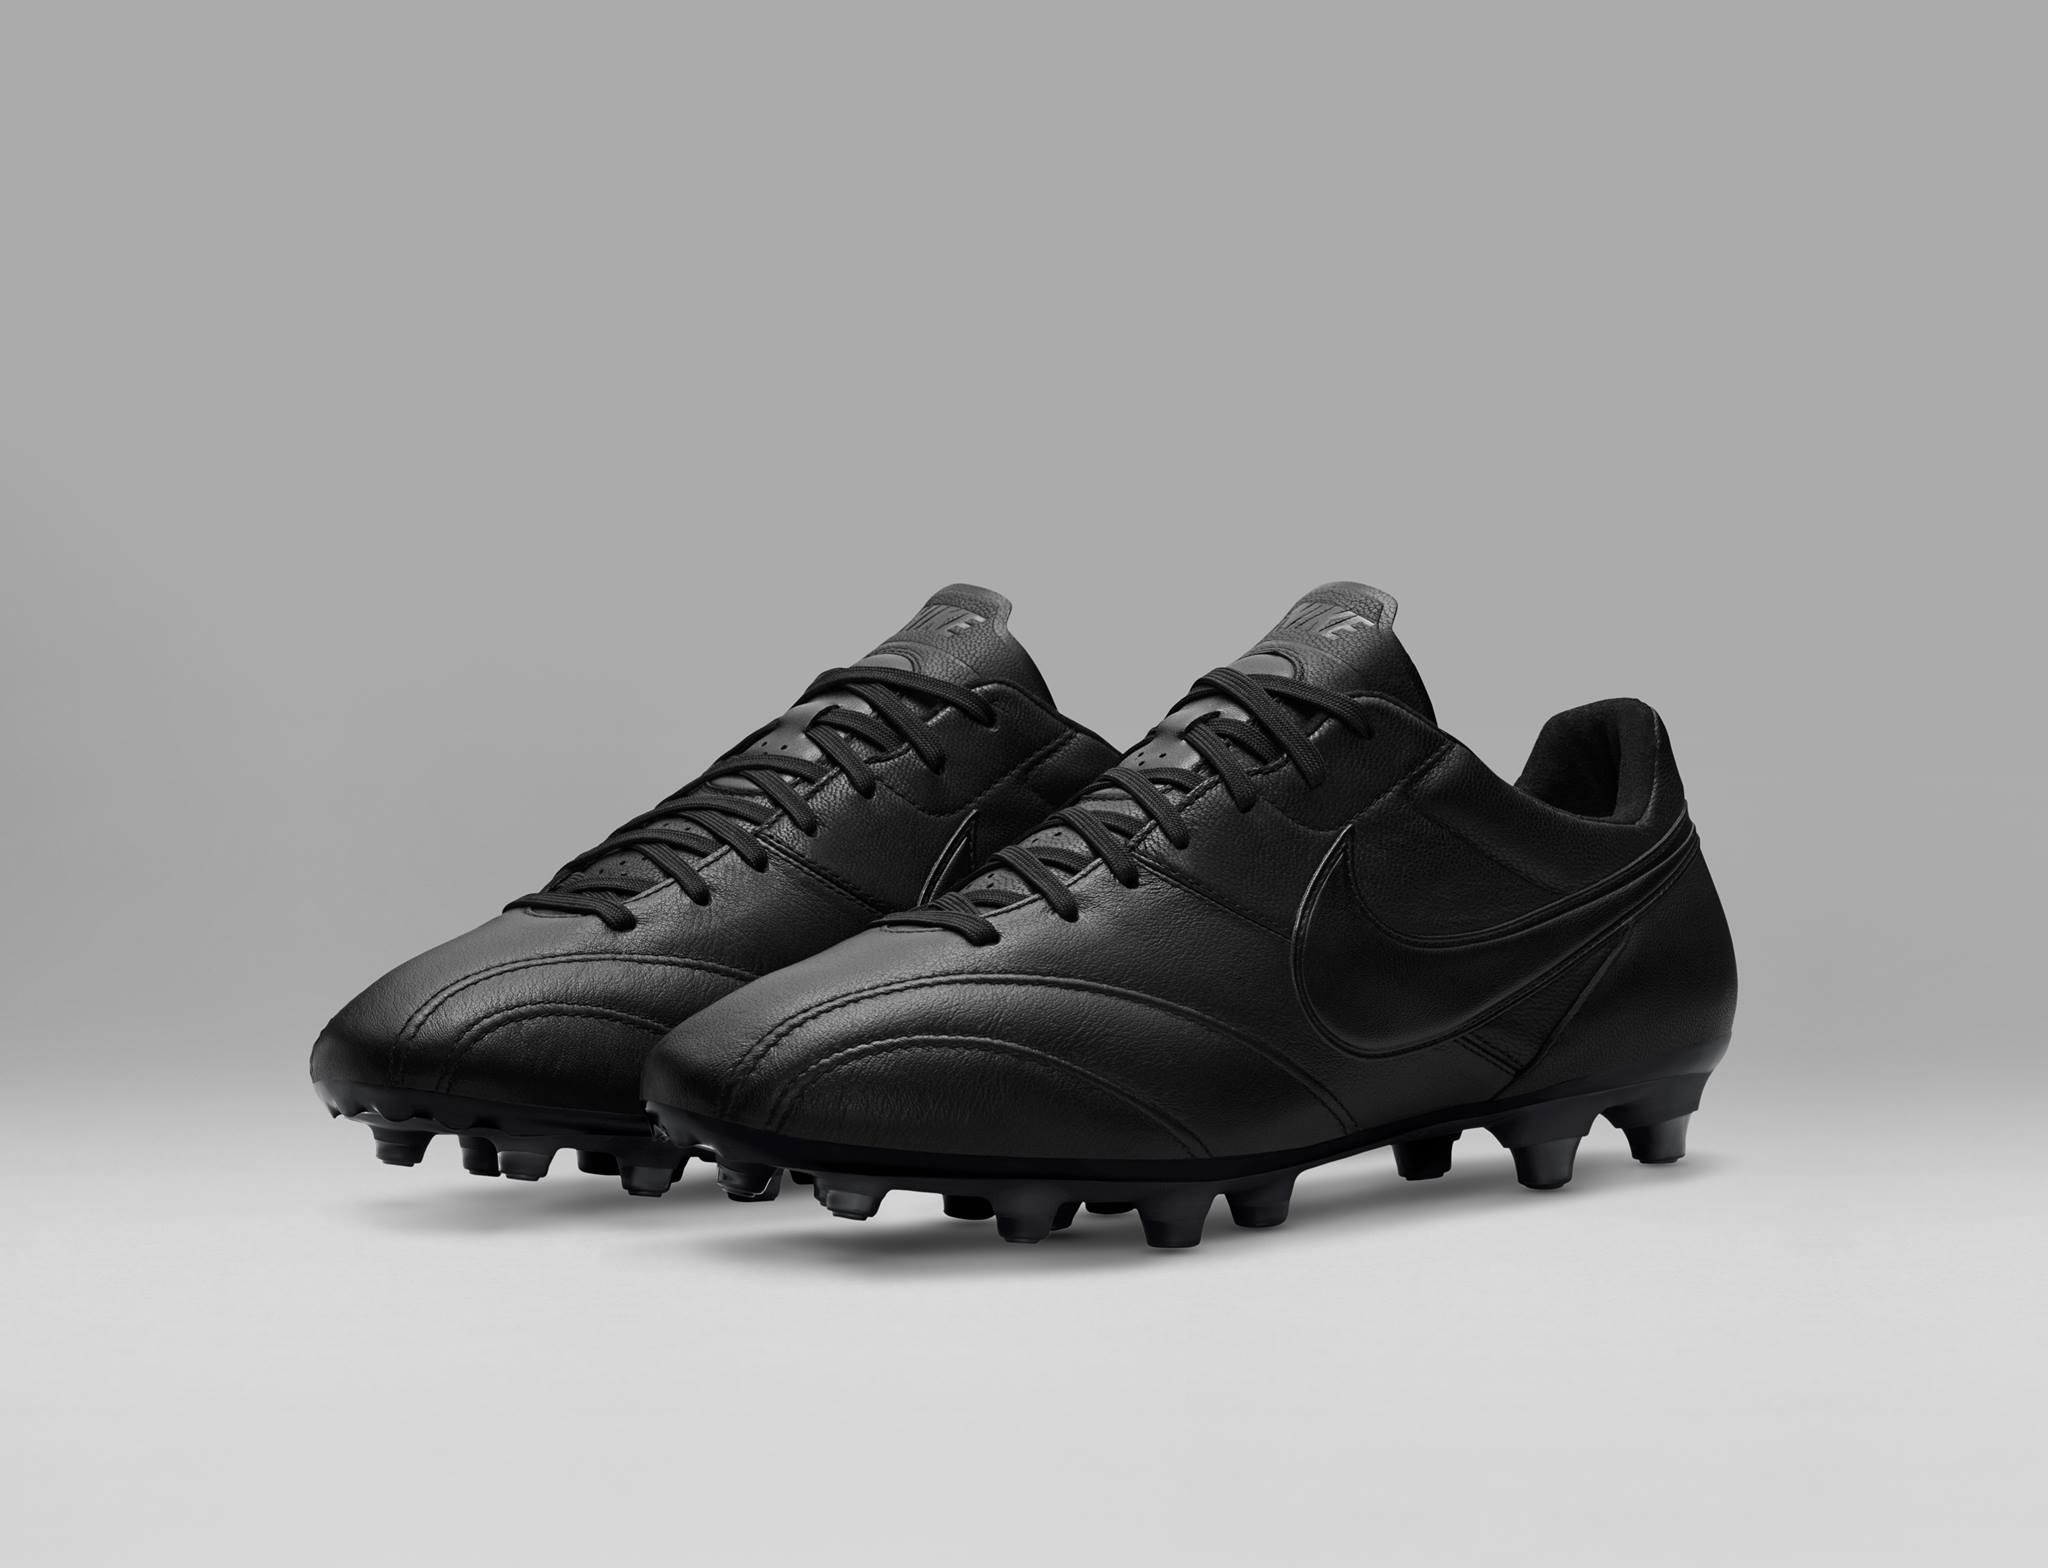 chaussure-football-nike-tiempo-premier-blackout